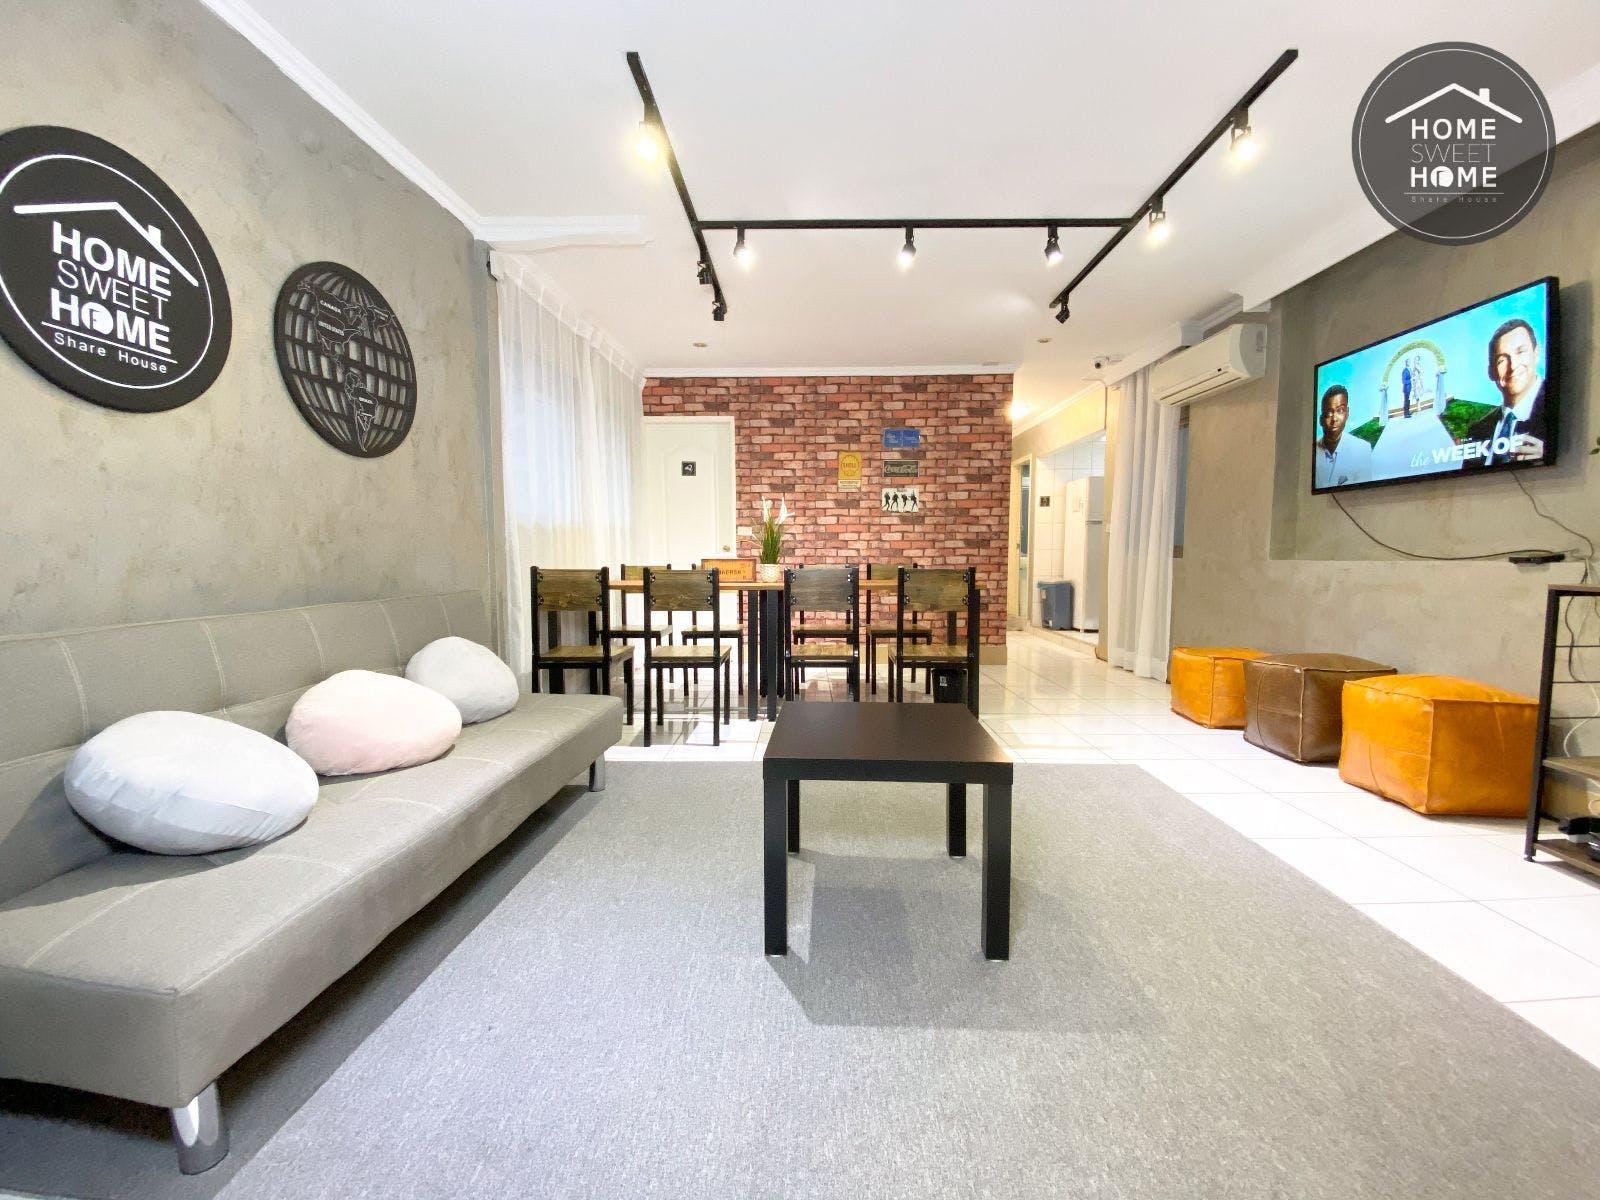 7 Residents   Shuangcheng St. - Taipei Zhongshan   Comfortable Urban Apts - Incl. Workspace